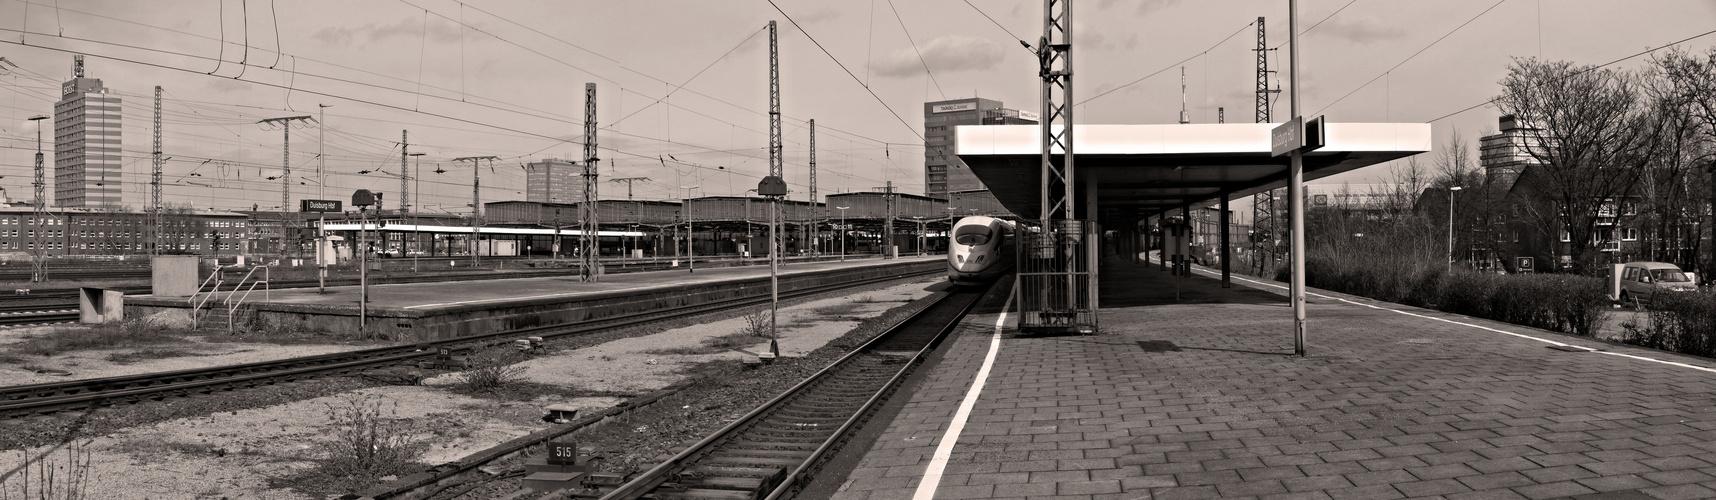 Duisburg Hbf